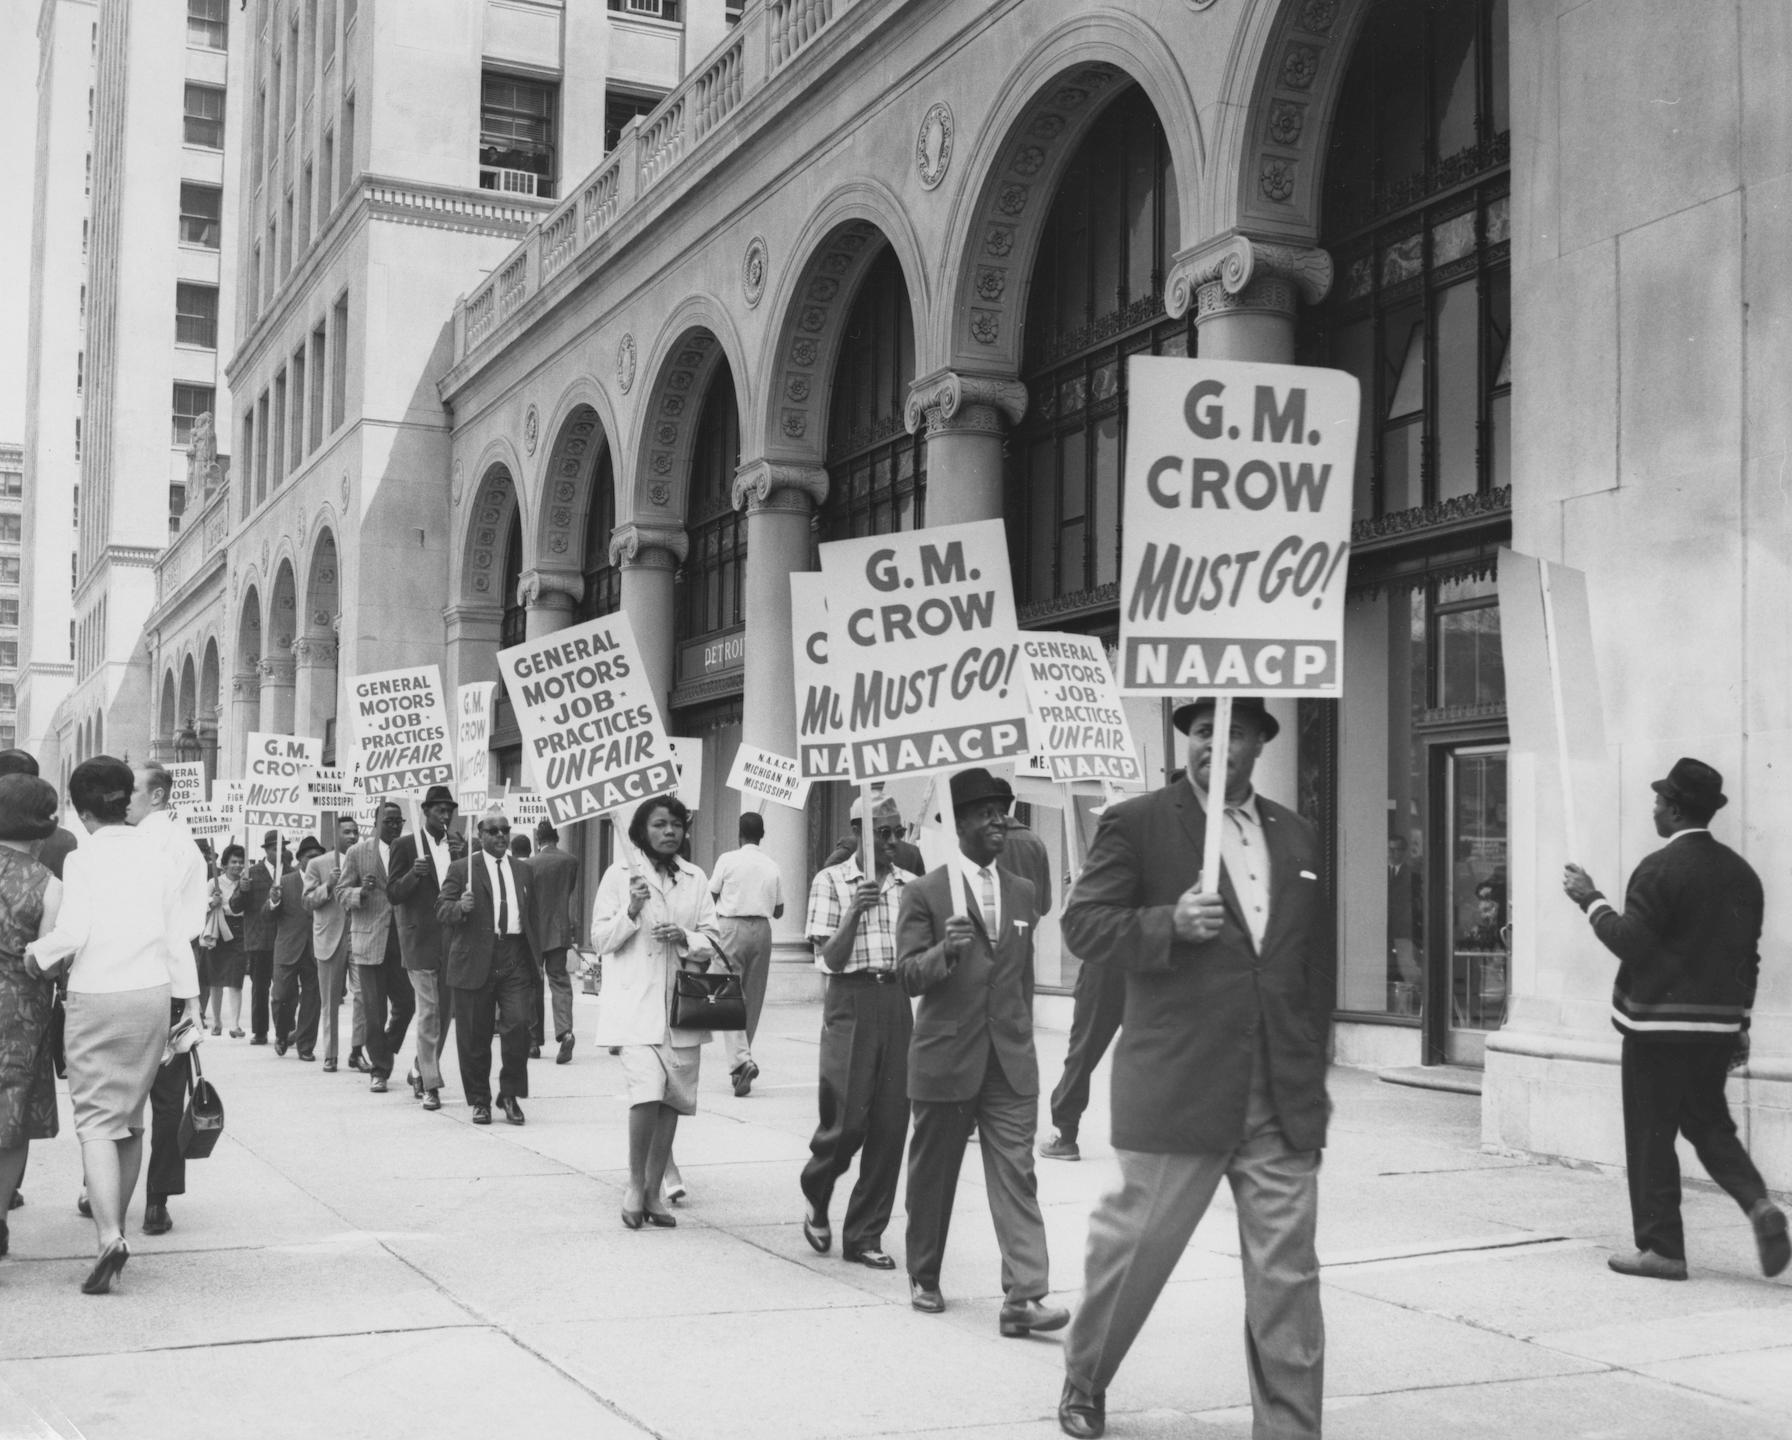 NAACP General Motors Protest, 1964